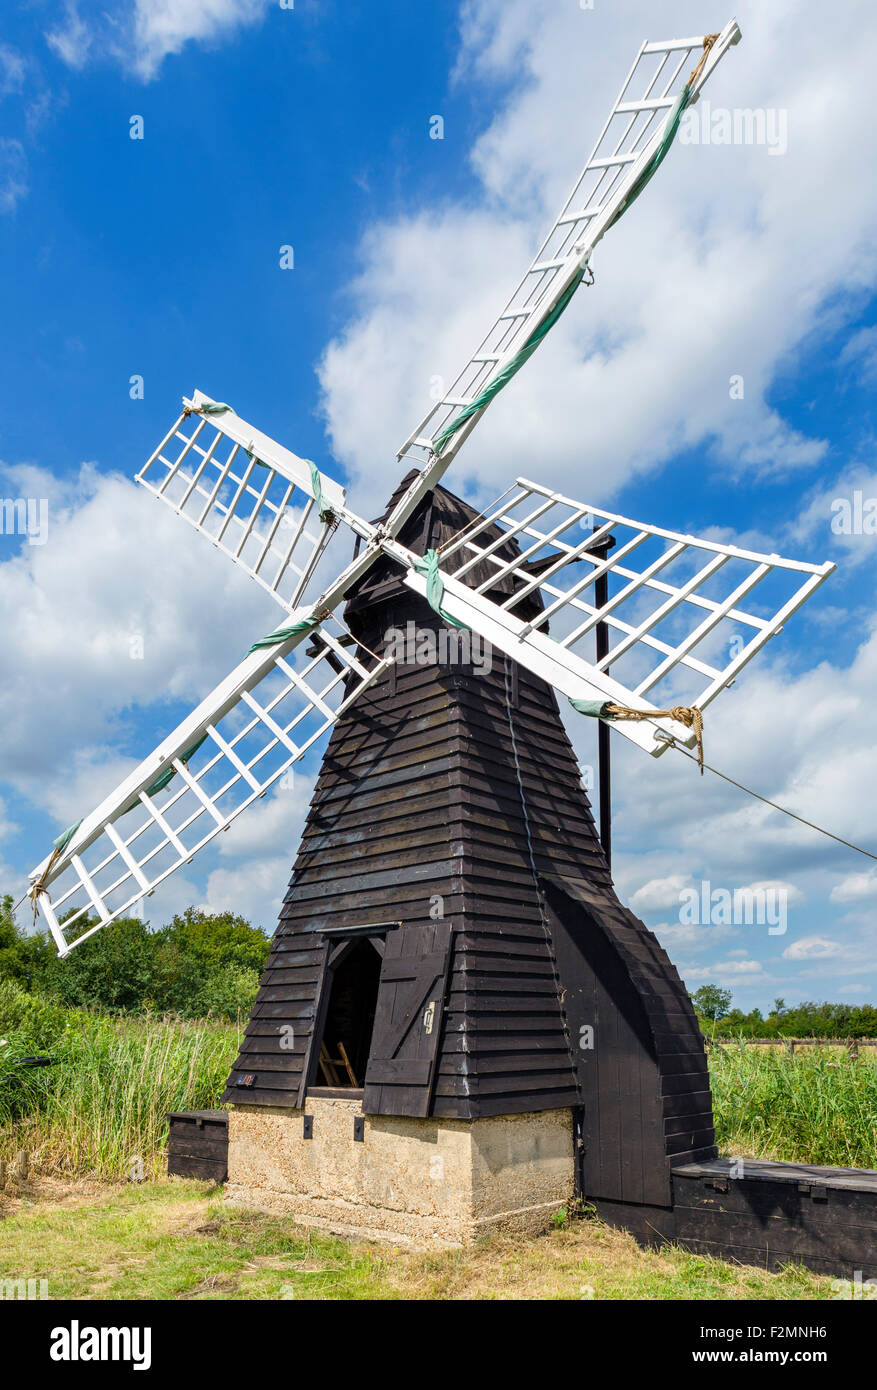 Windmill at Wicken Fen, a wetland nature reserve near Wicken, Cambridgeshire, England, UK Stock Photo